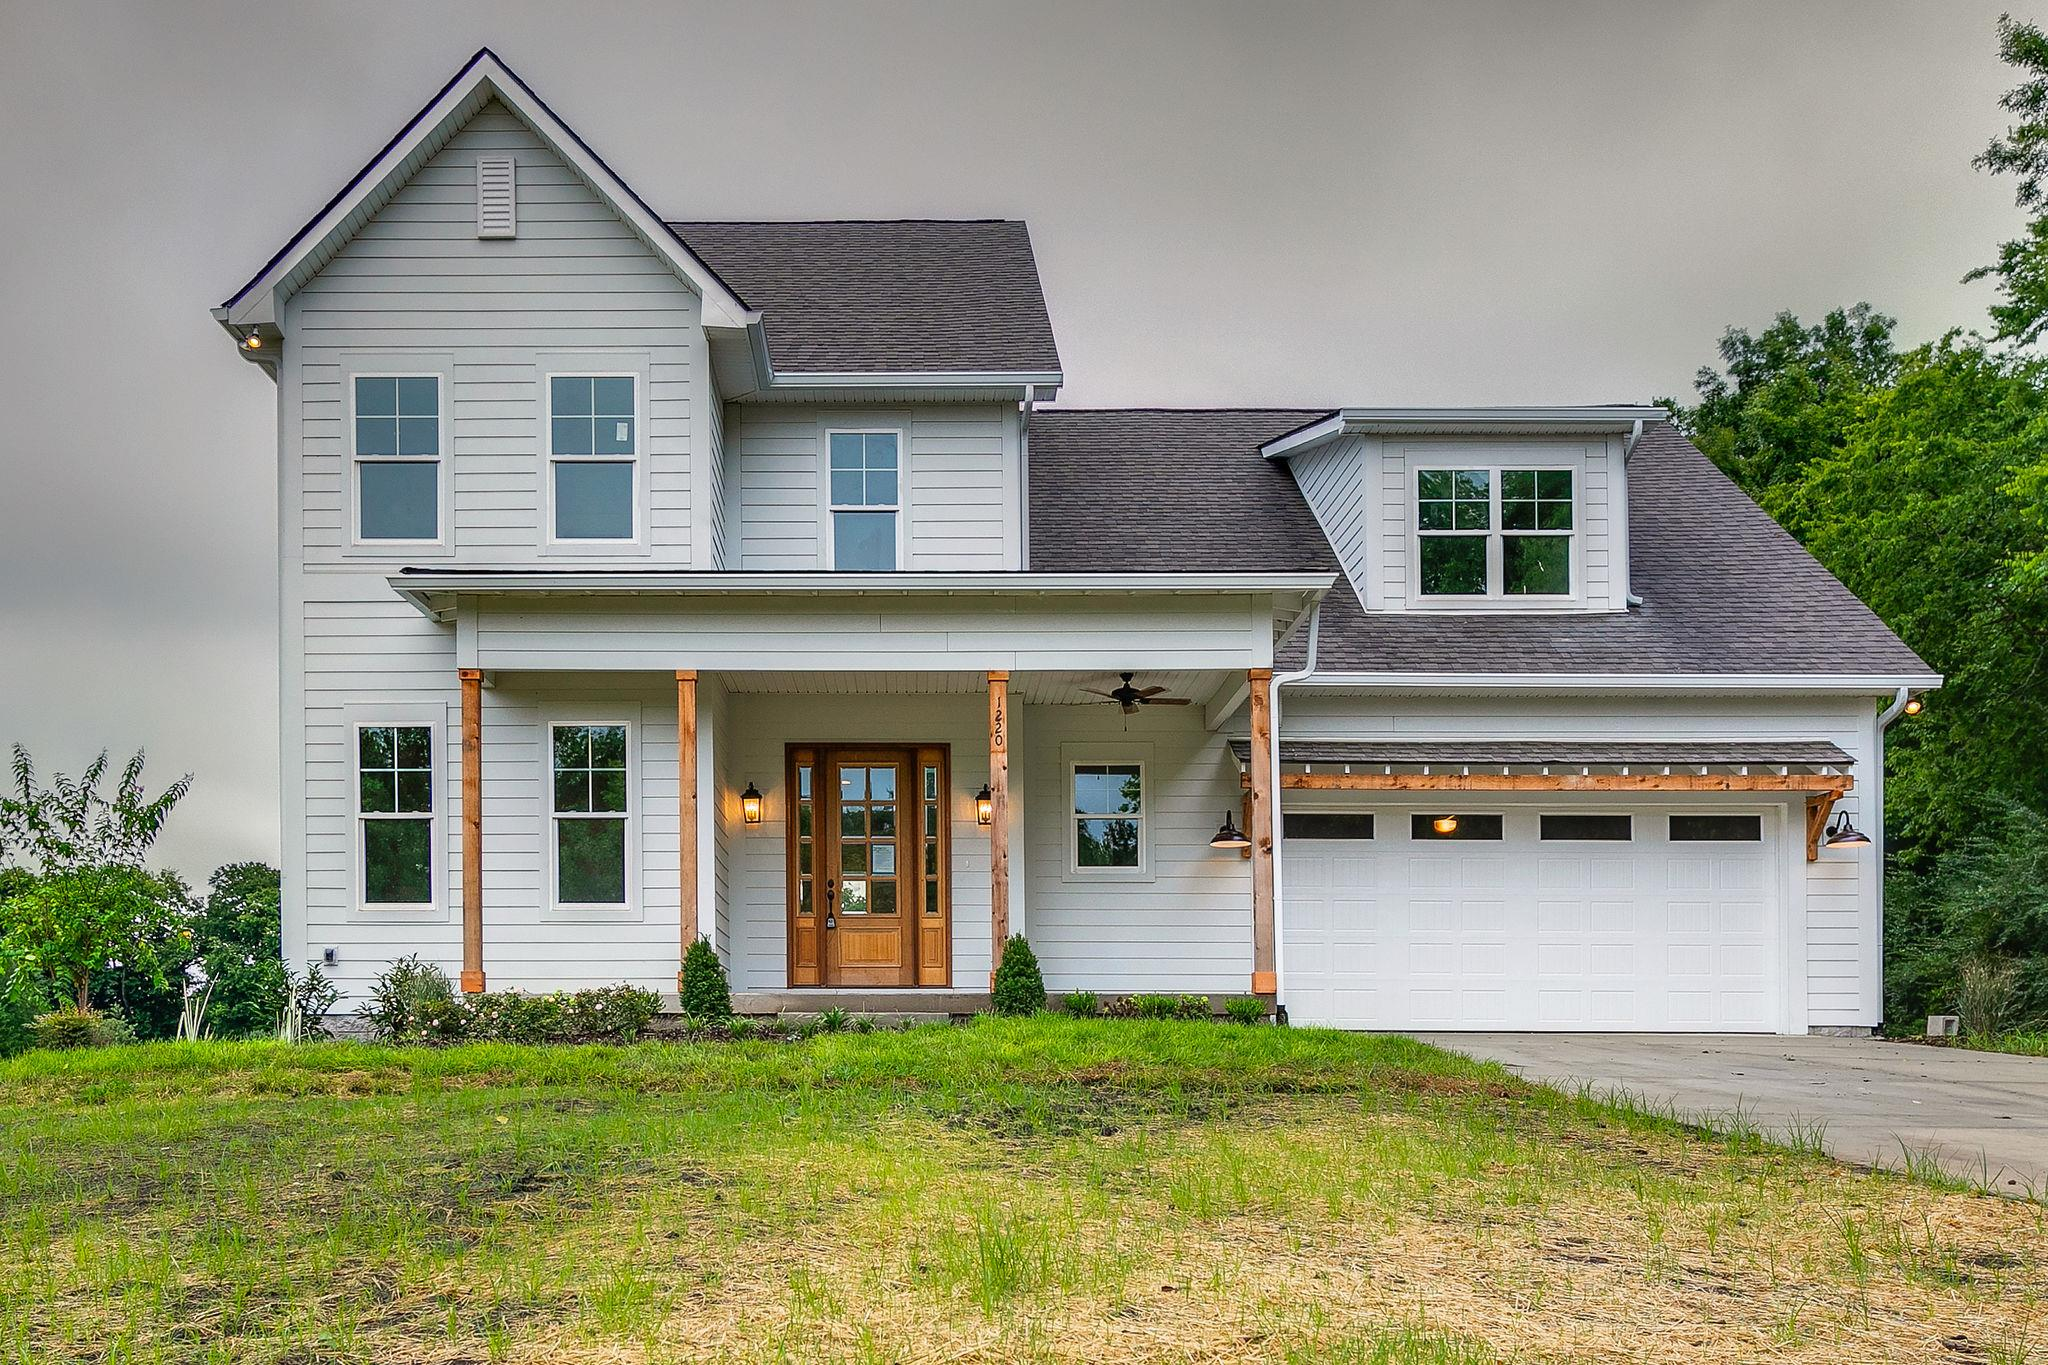 1220 Carters Creek Pike, Columbia, TN 38401 - Columbia, TN real estate listing